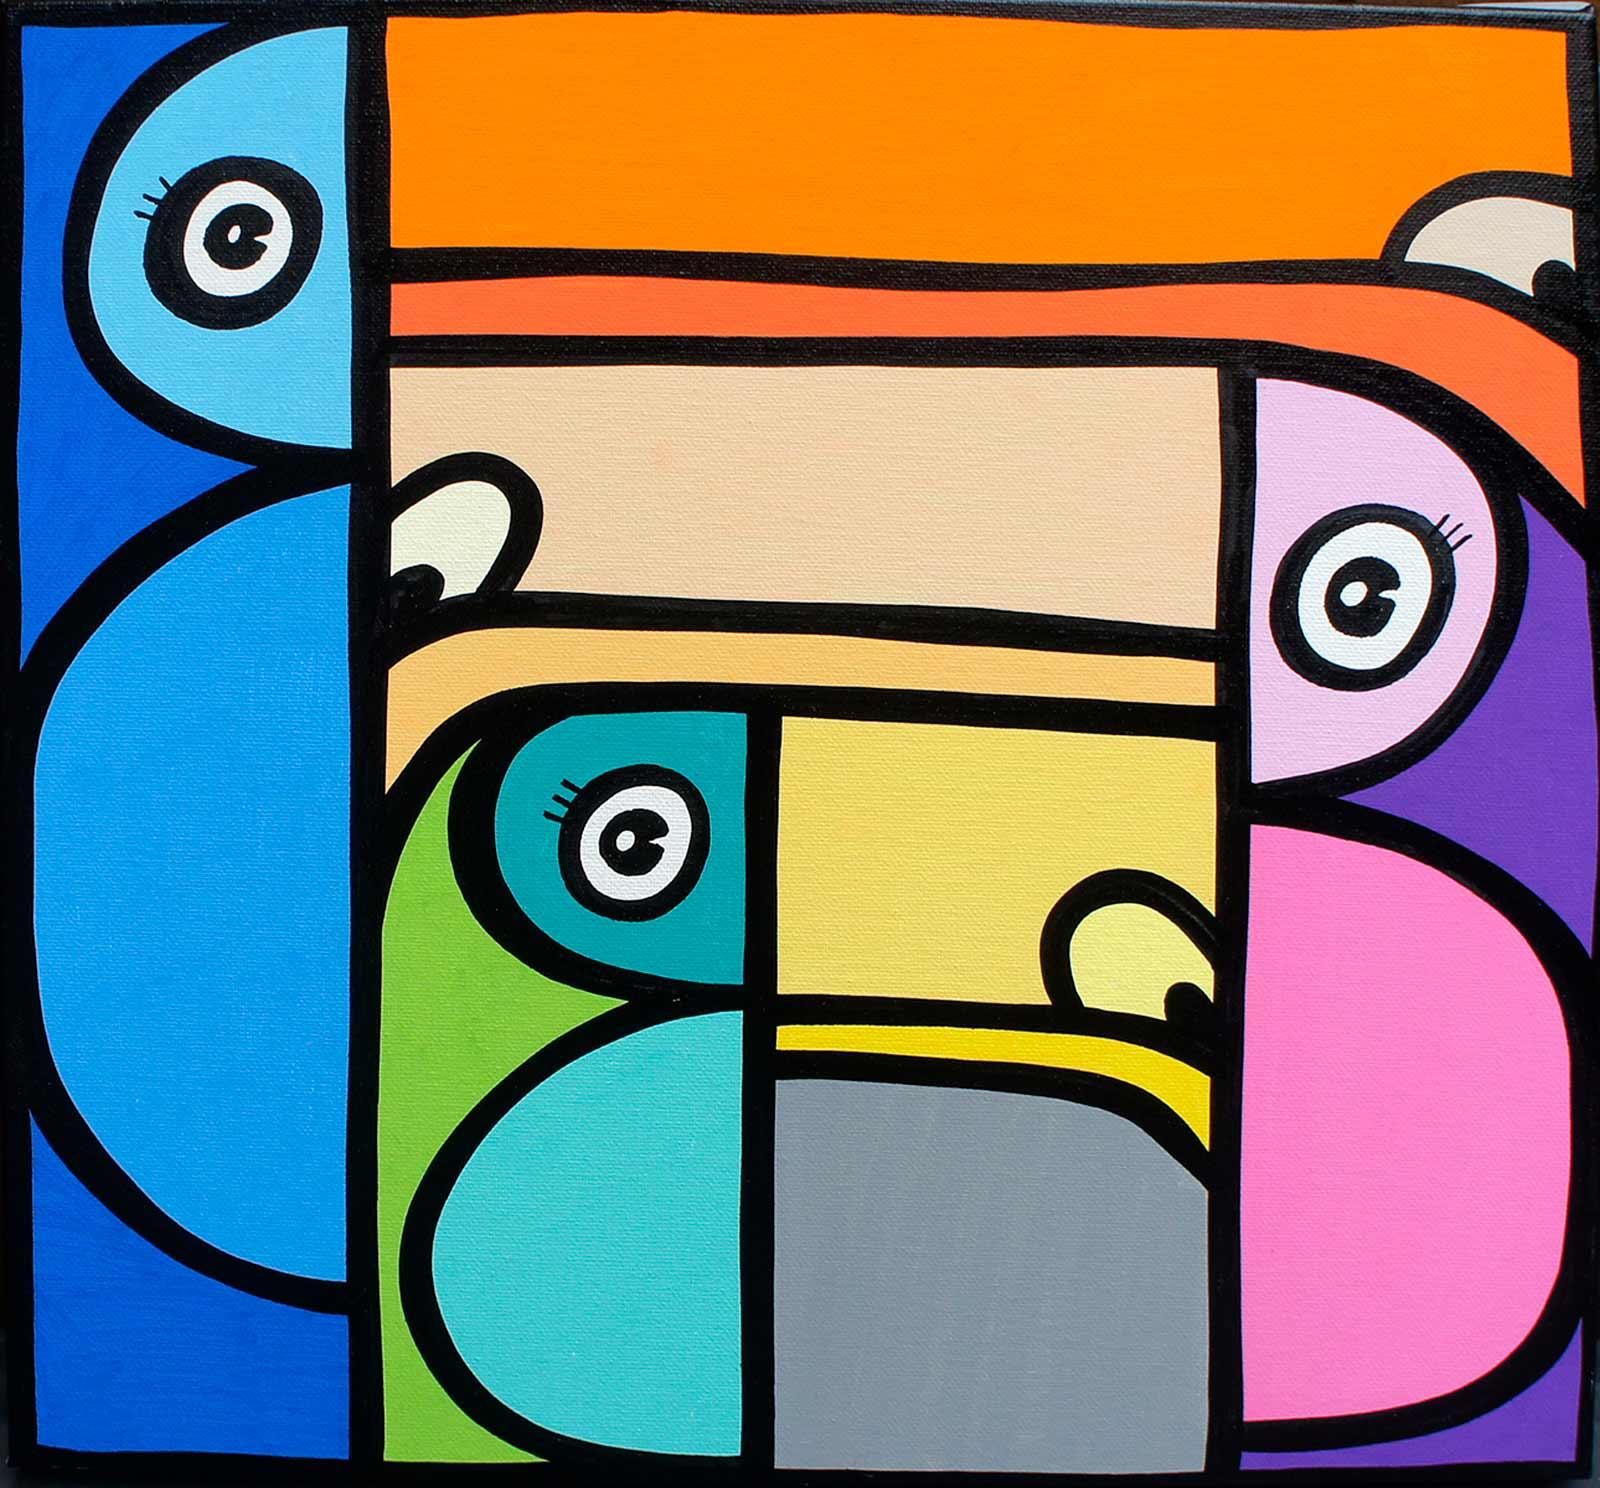 Toucans, Kev Munday